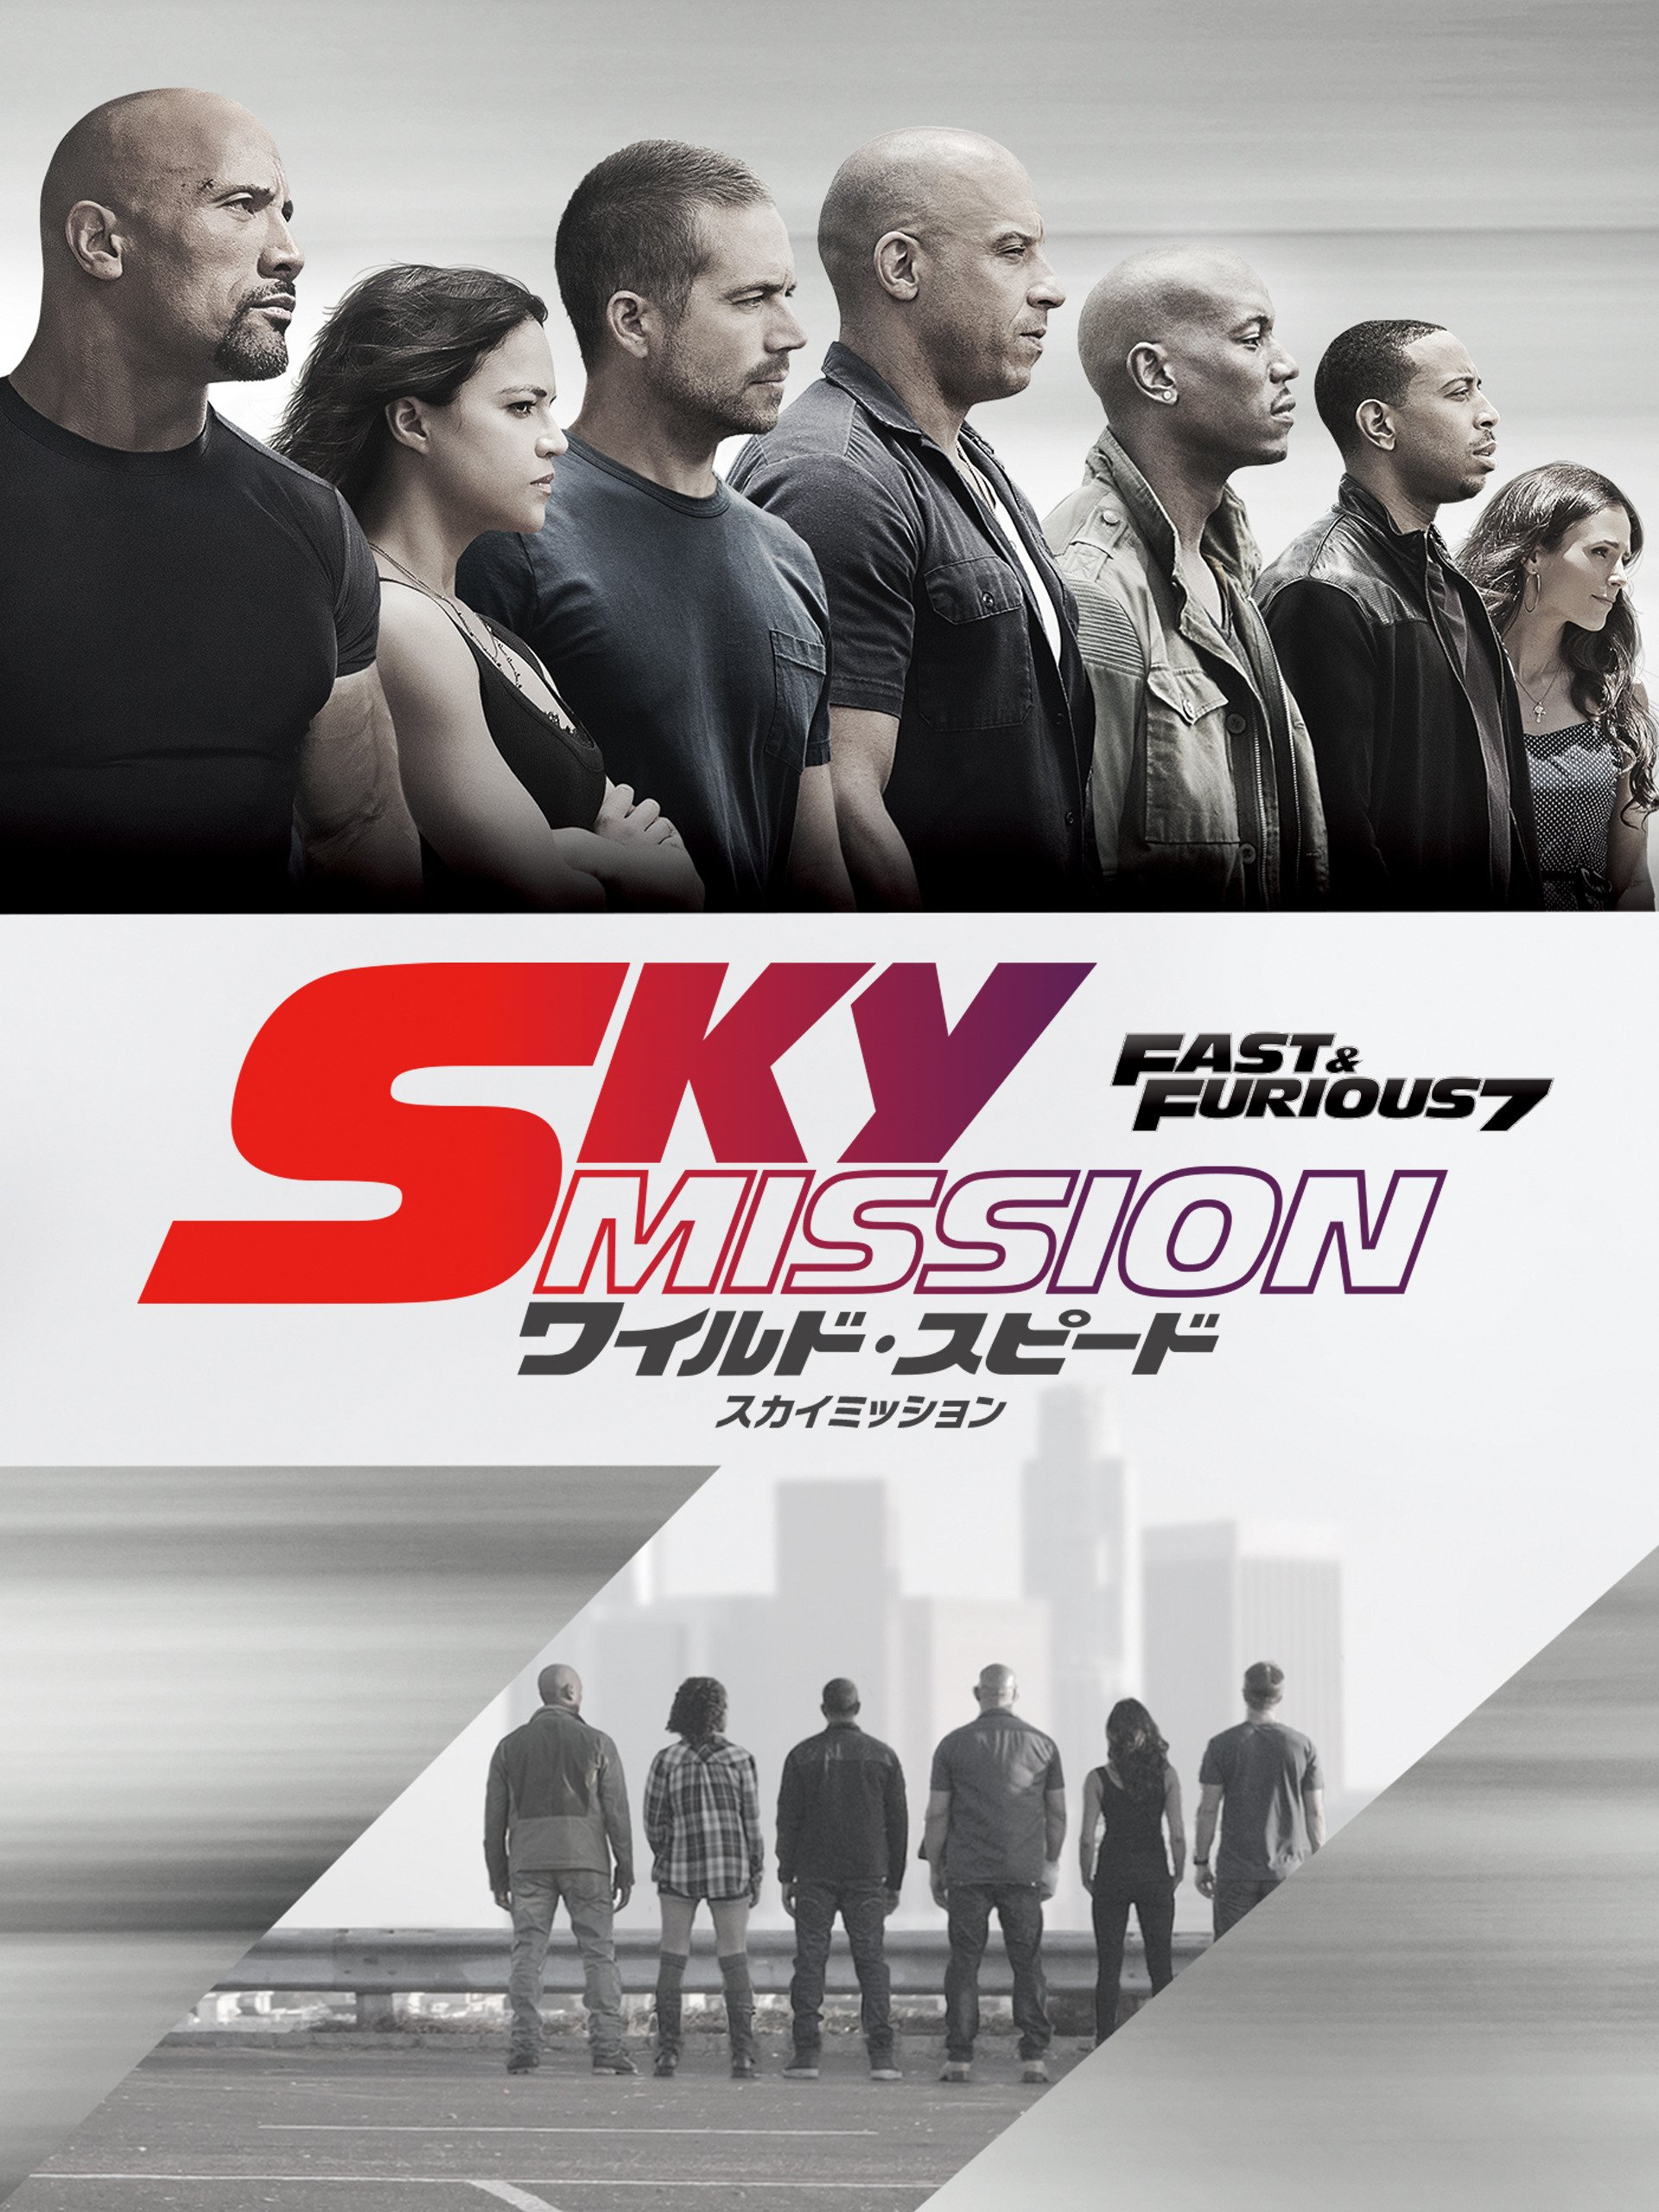 Amazon.co.jp ワイルド・スピード , スカイミッション (字幕版)を観る